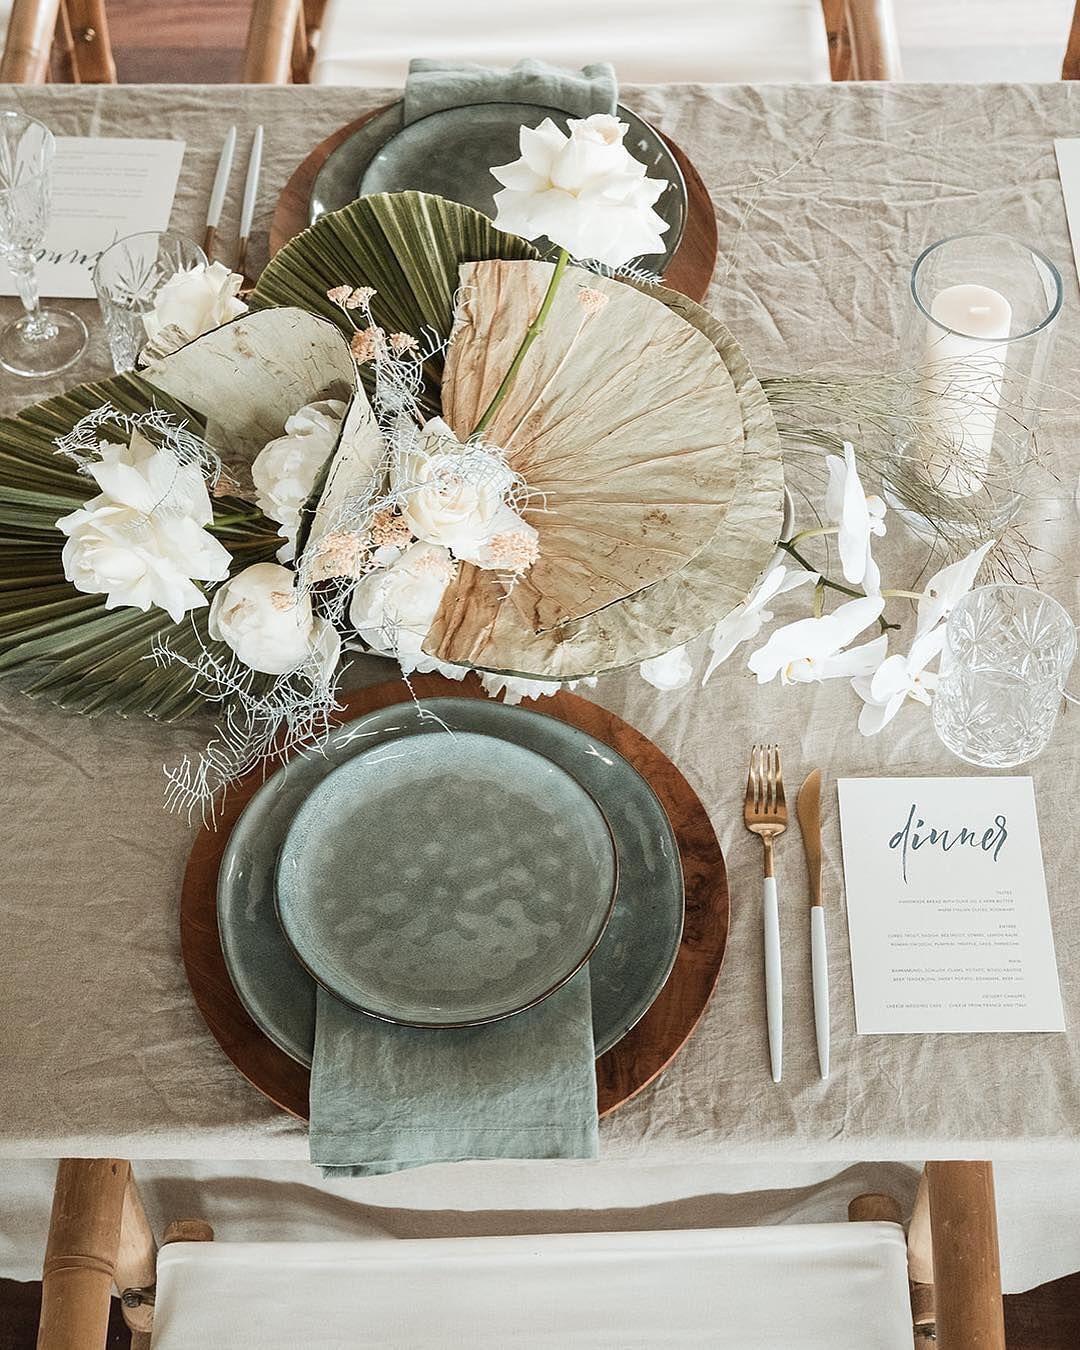 Cari Inspirasi Pernikahan? Kamu Wajib Follow 5 Akun Instagram Ini